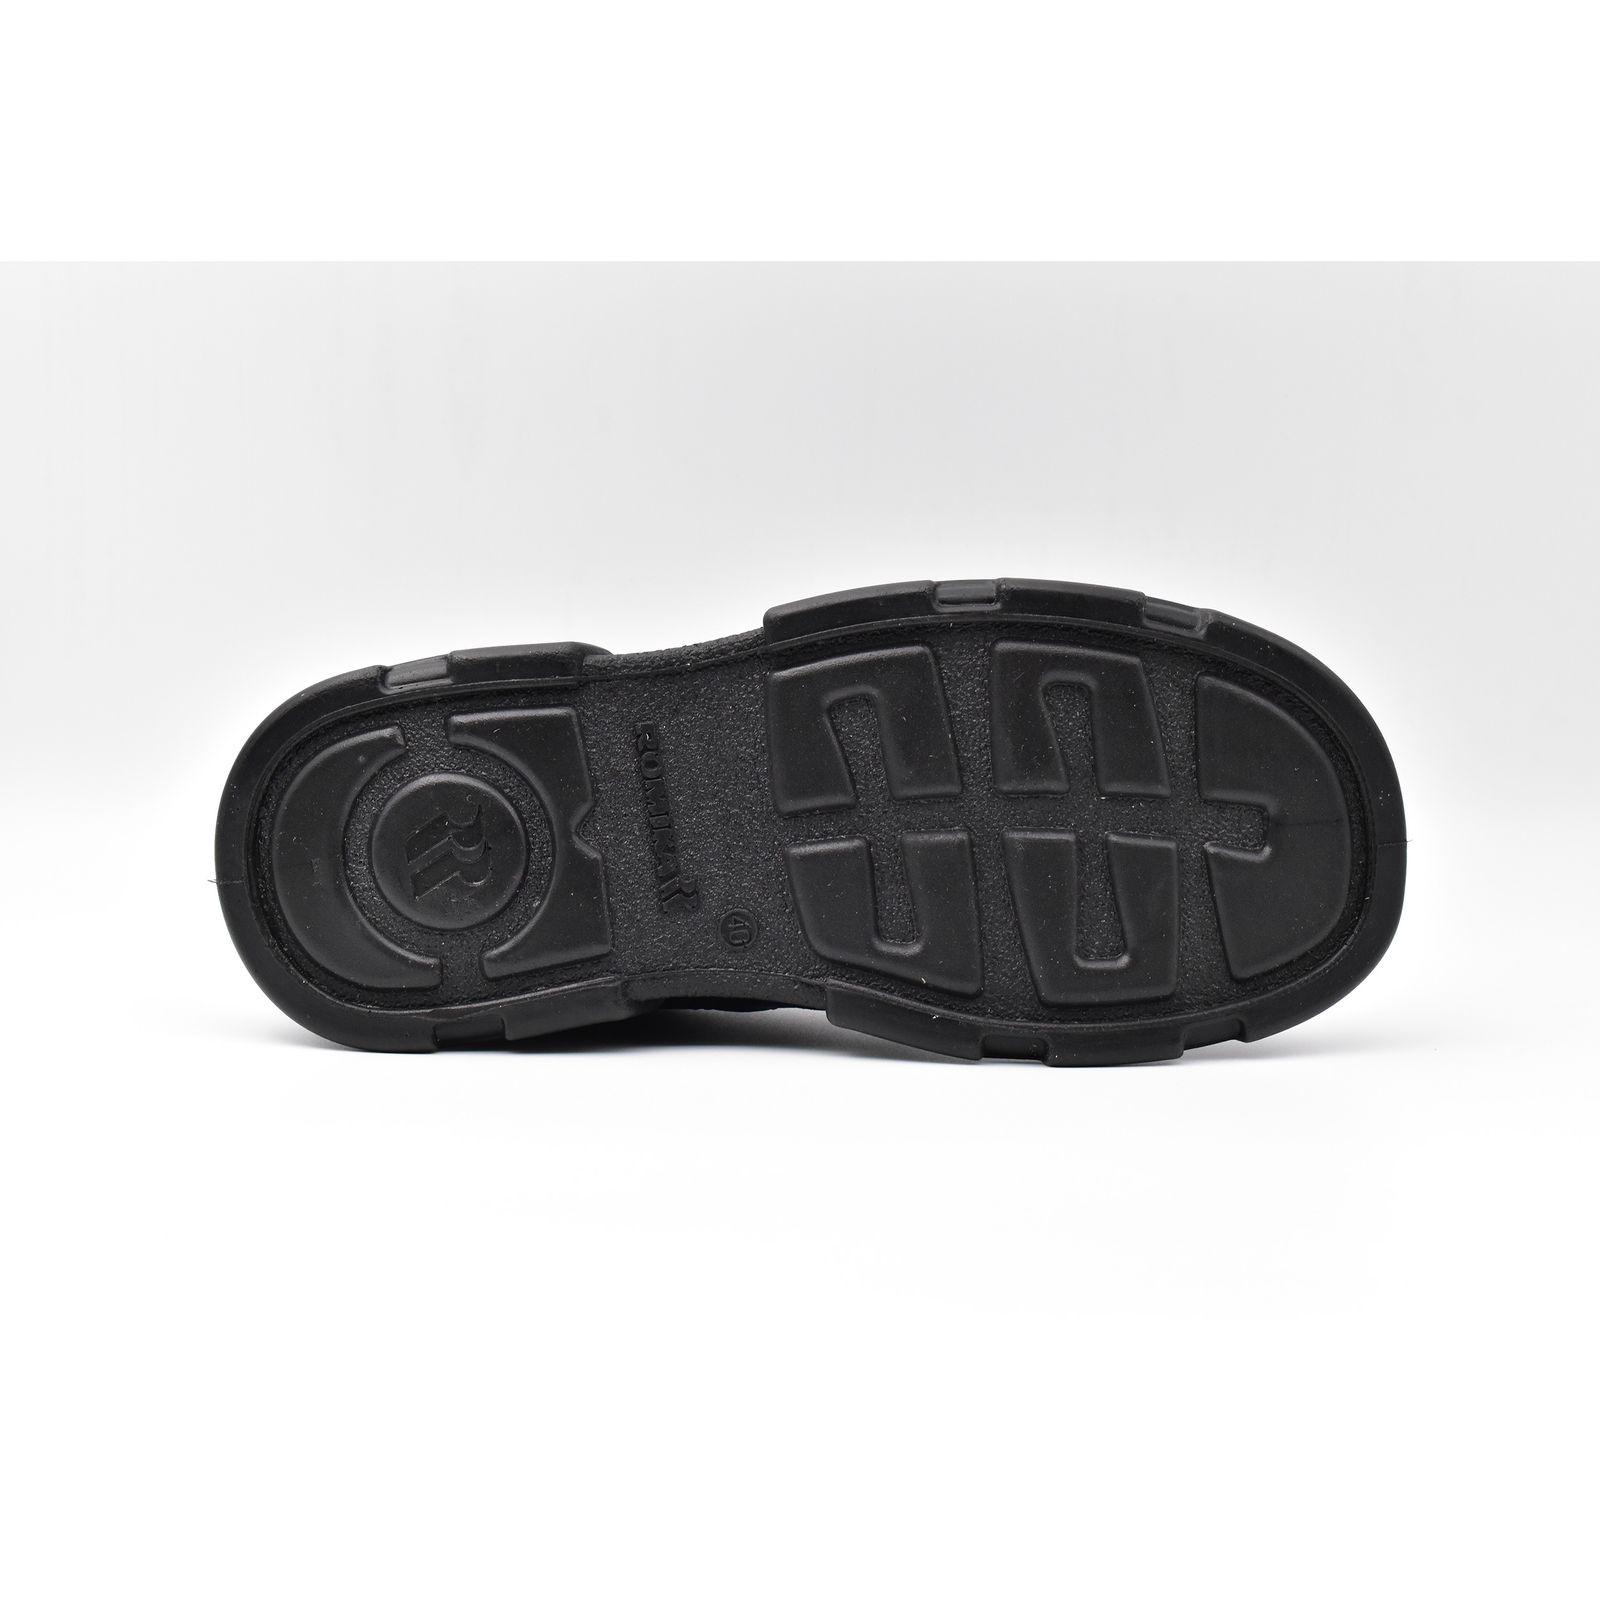 کفش روزمره مردانه البرز مدل تورنتو کد 7009 -  - 12